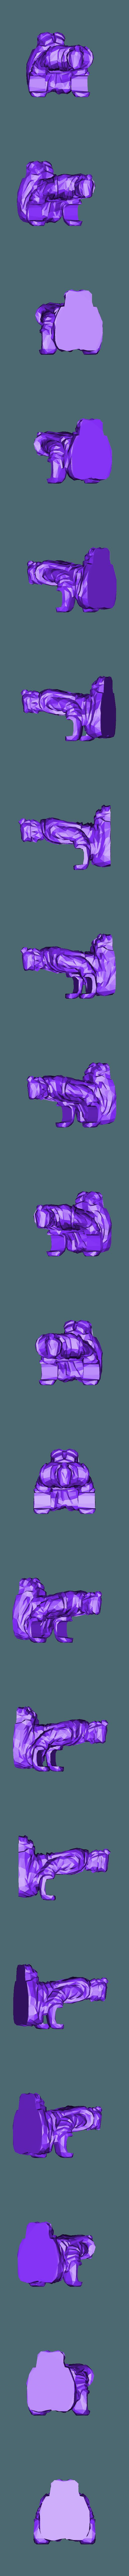 Samurai-Holder.stl Download STL file 5 in 1 • 3D printer model, PorcSkulpt9